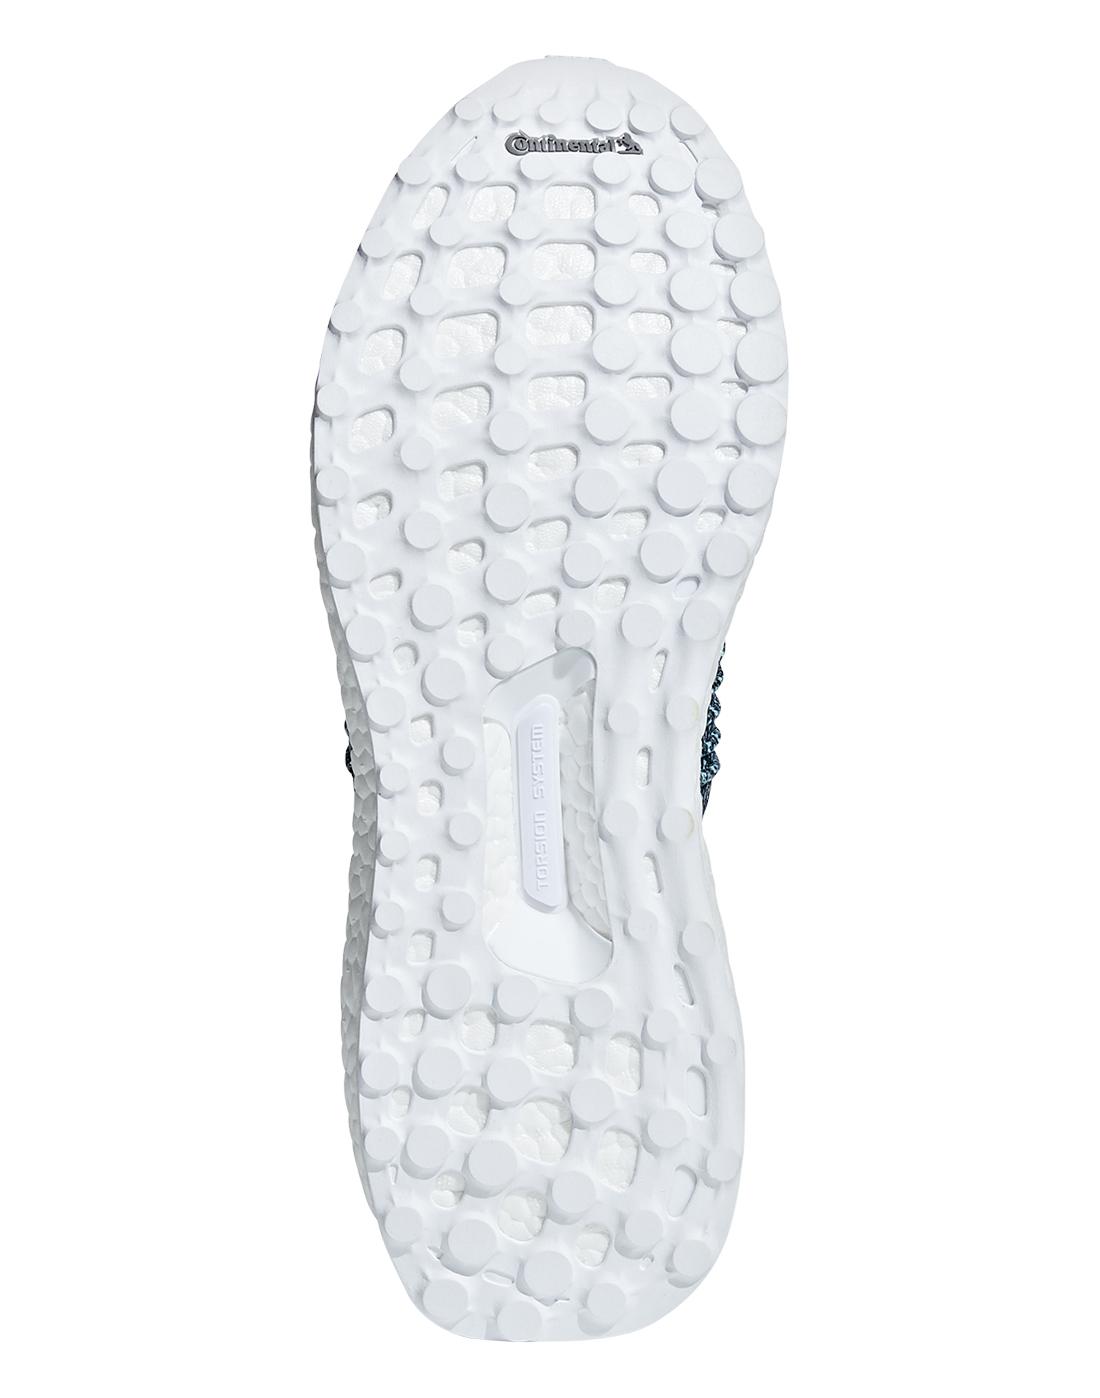 brand new fd8ed b99ef adidas. Mens Ultraboost Laceless Parley. Mens Ultraboost Laceless Parley ·  Mens Ultraboost Laceless Parley ...